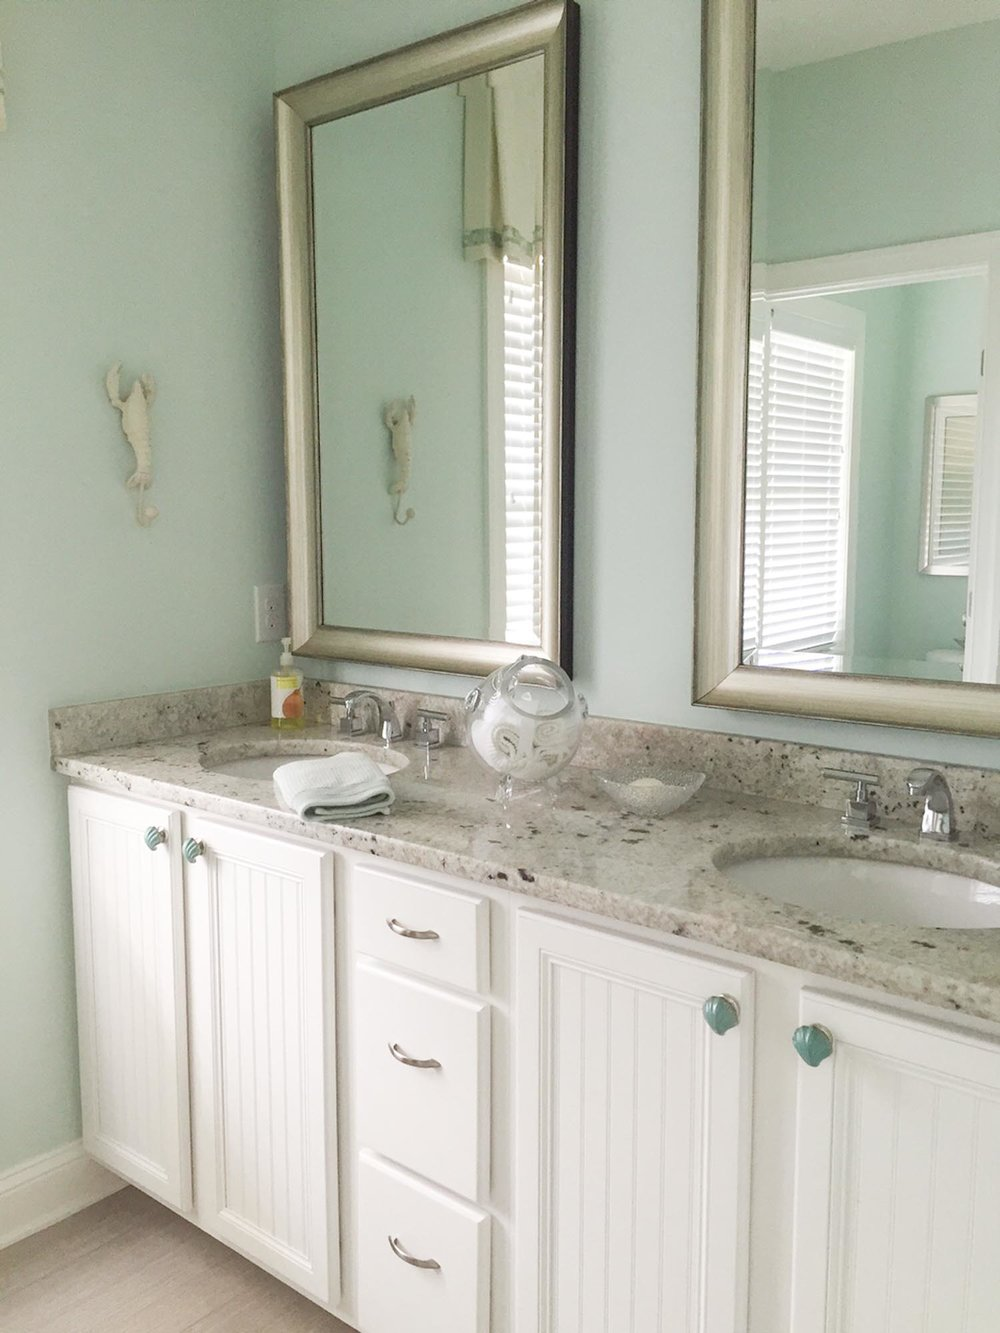 Master bathroom vanity with granite countertops